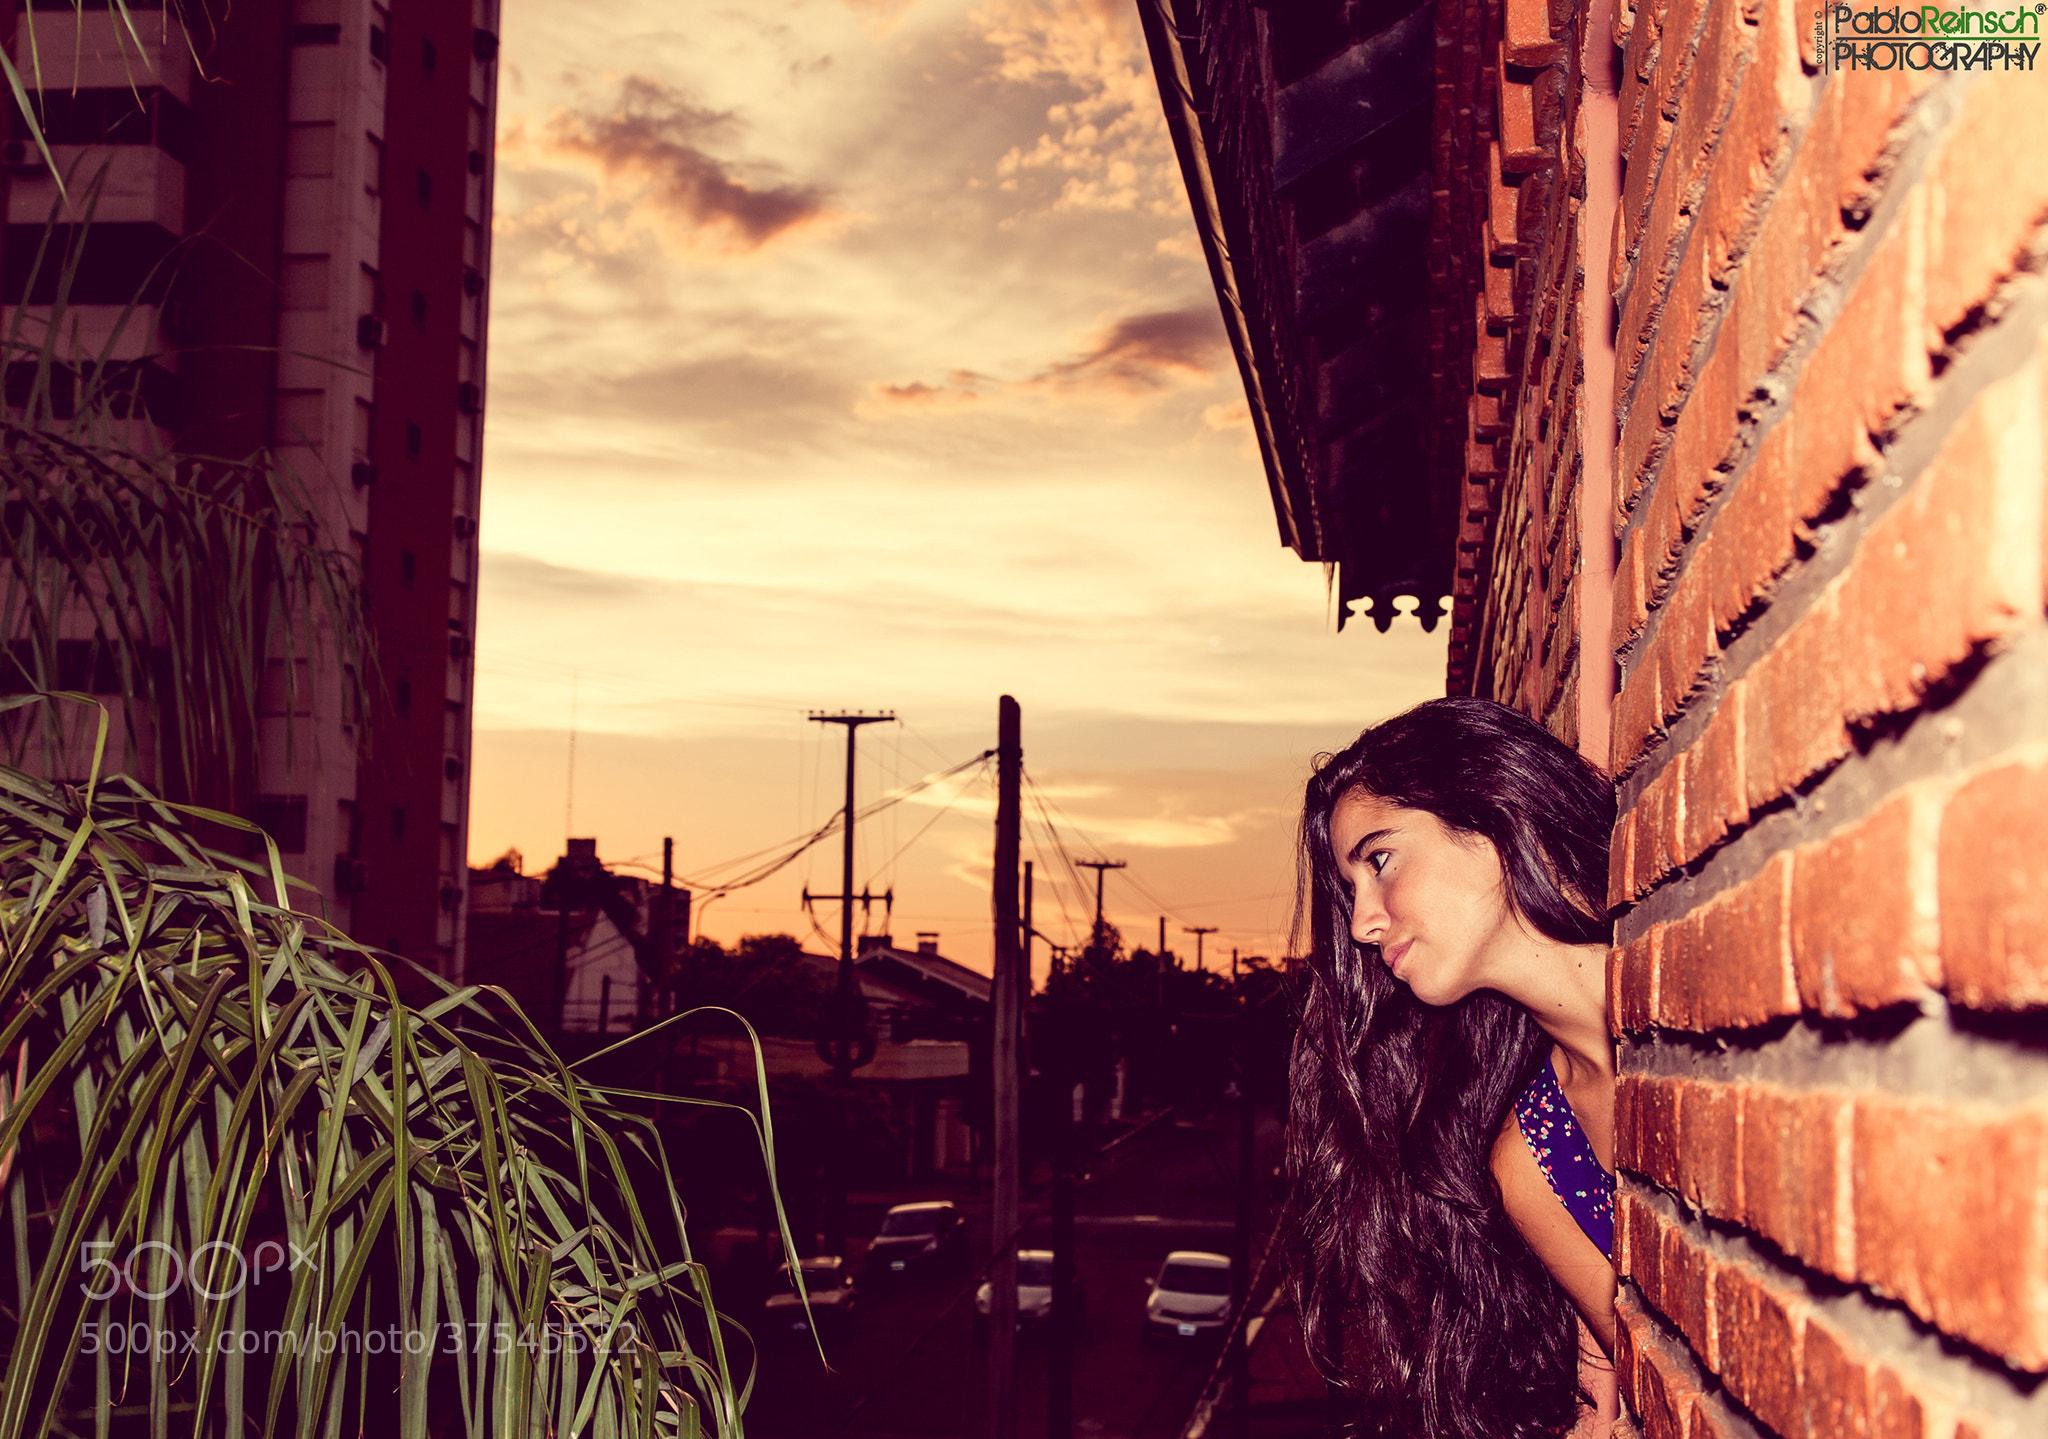 Photograph Bella vista.- by Pablo Reinsch on 500px